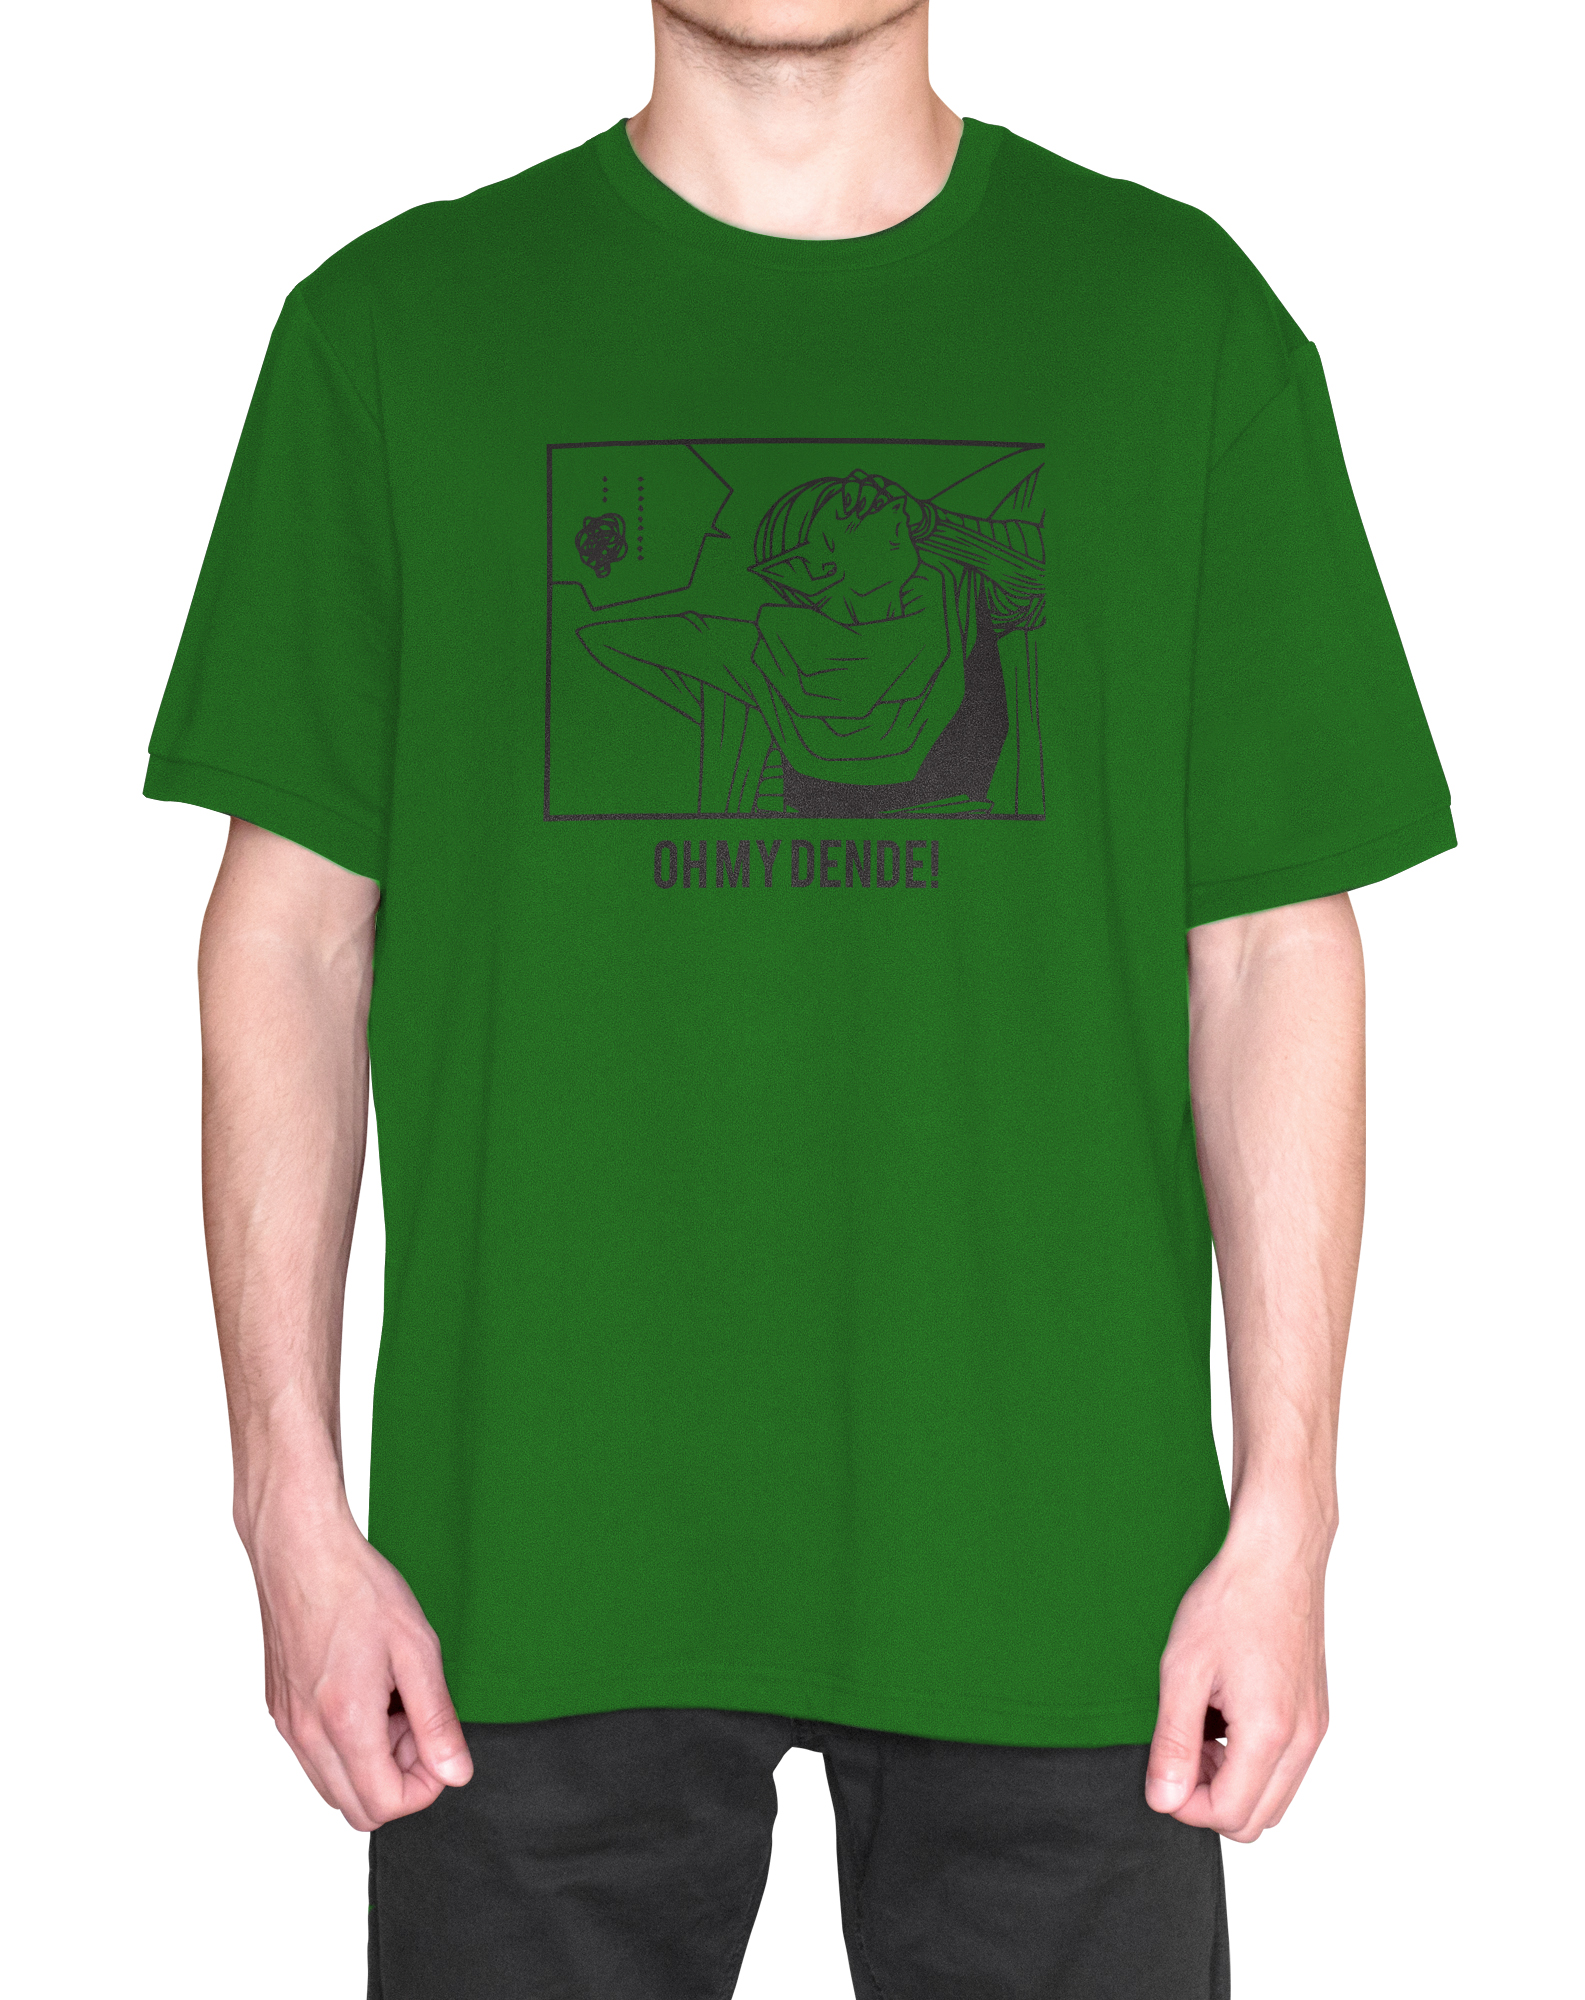 Oh My Dende Piccolo Namekian Anime T-Shirt